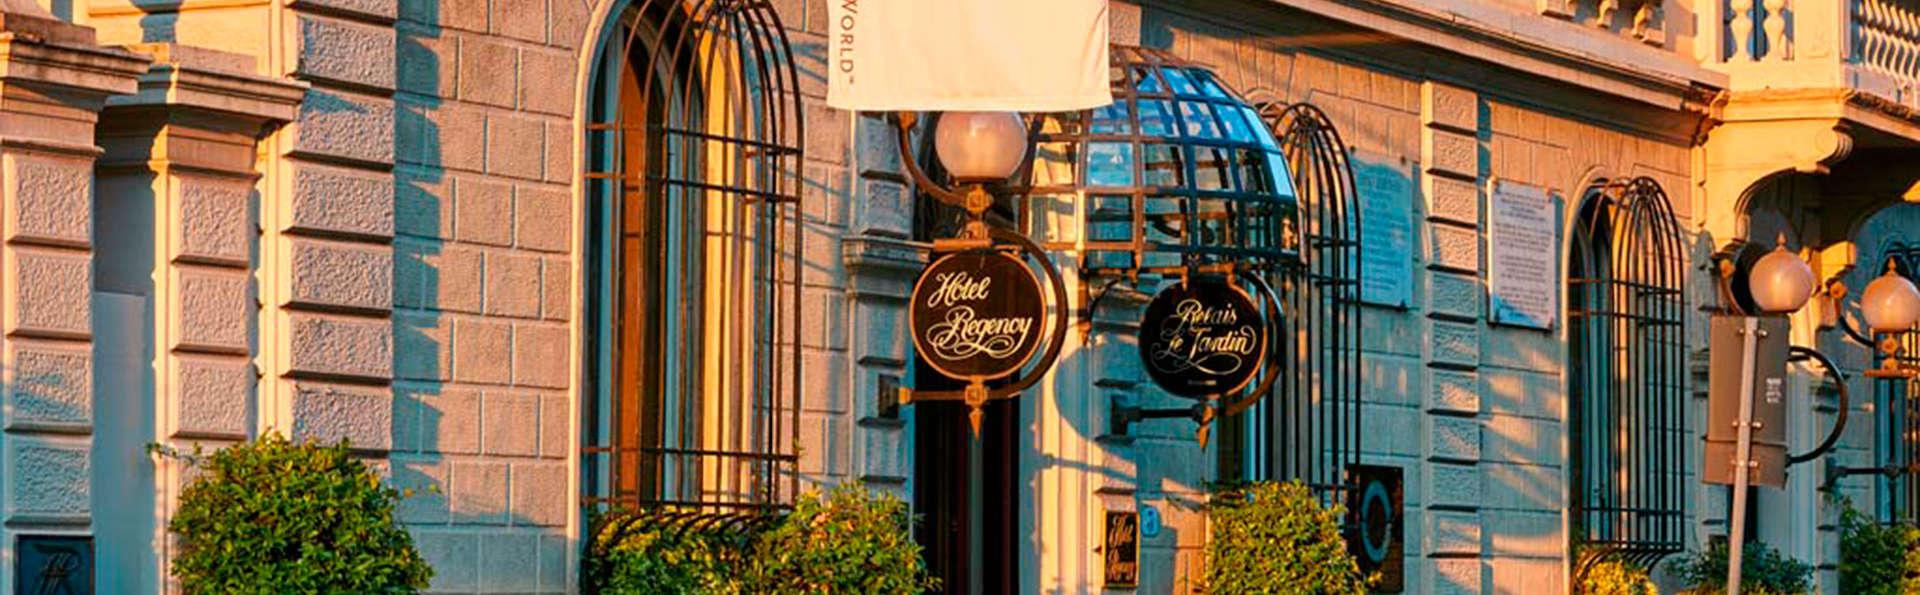 Hotel Regency - EDIT_front.jpg